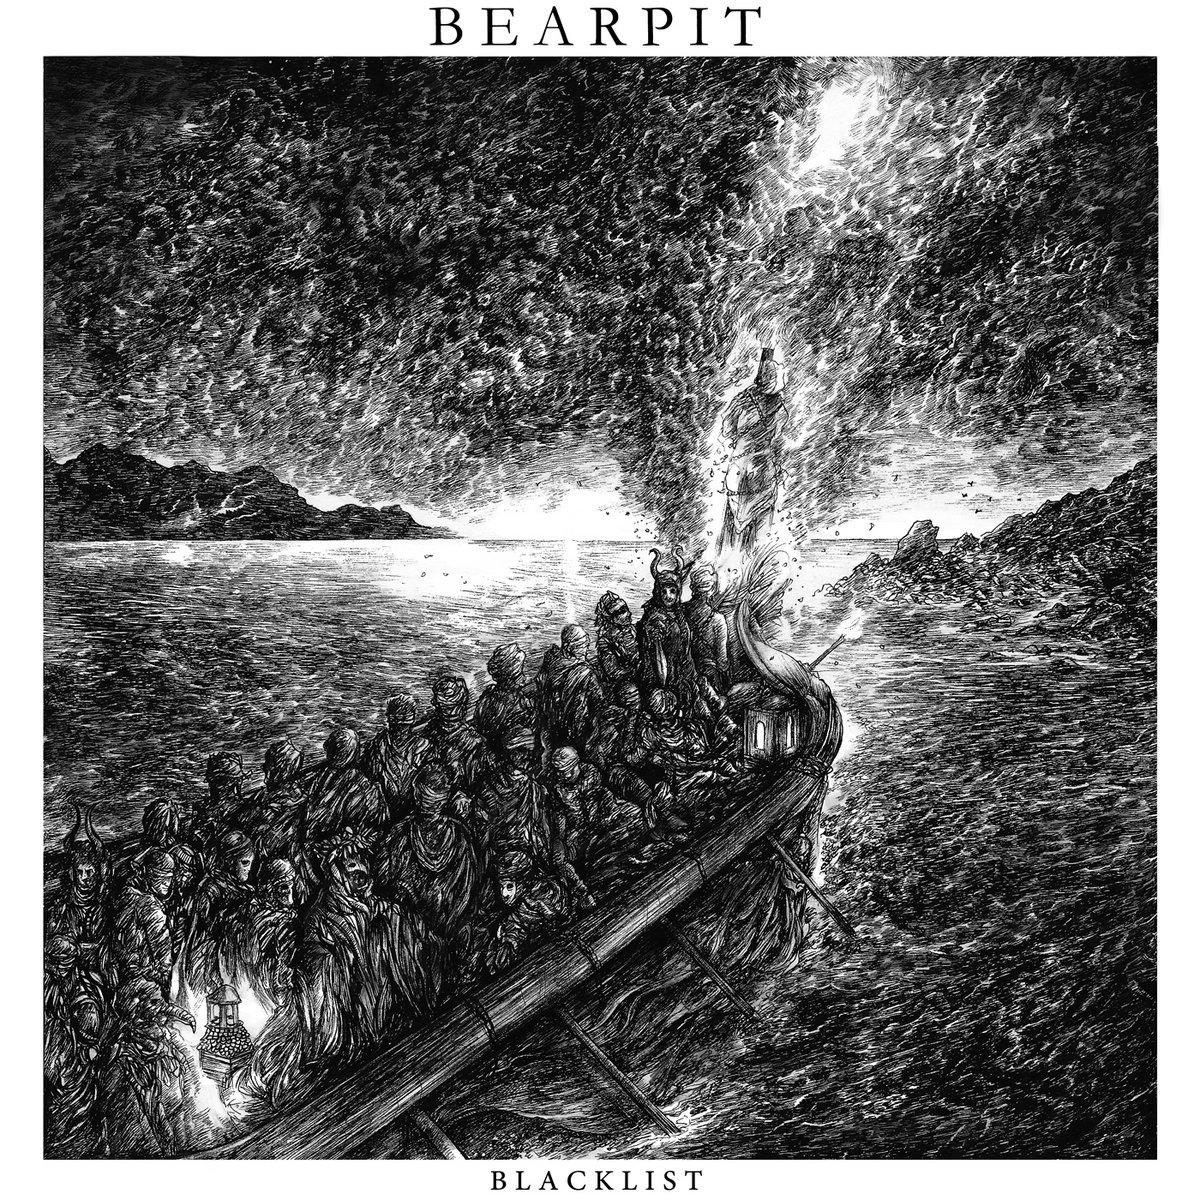 BEARPIT - BLACKLIST [EP] (2017)